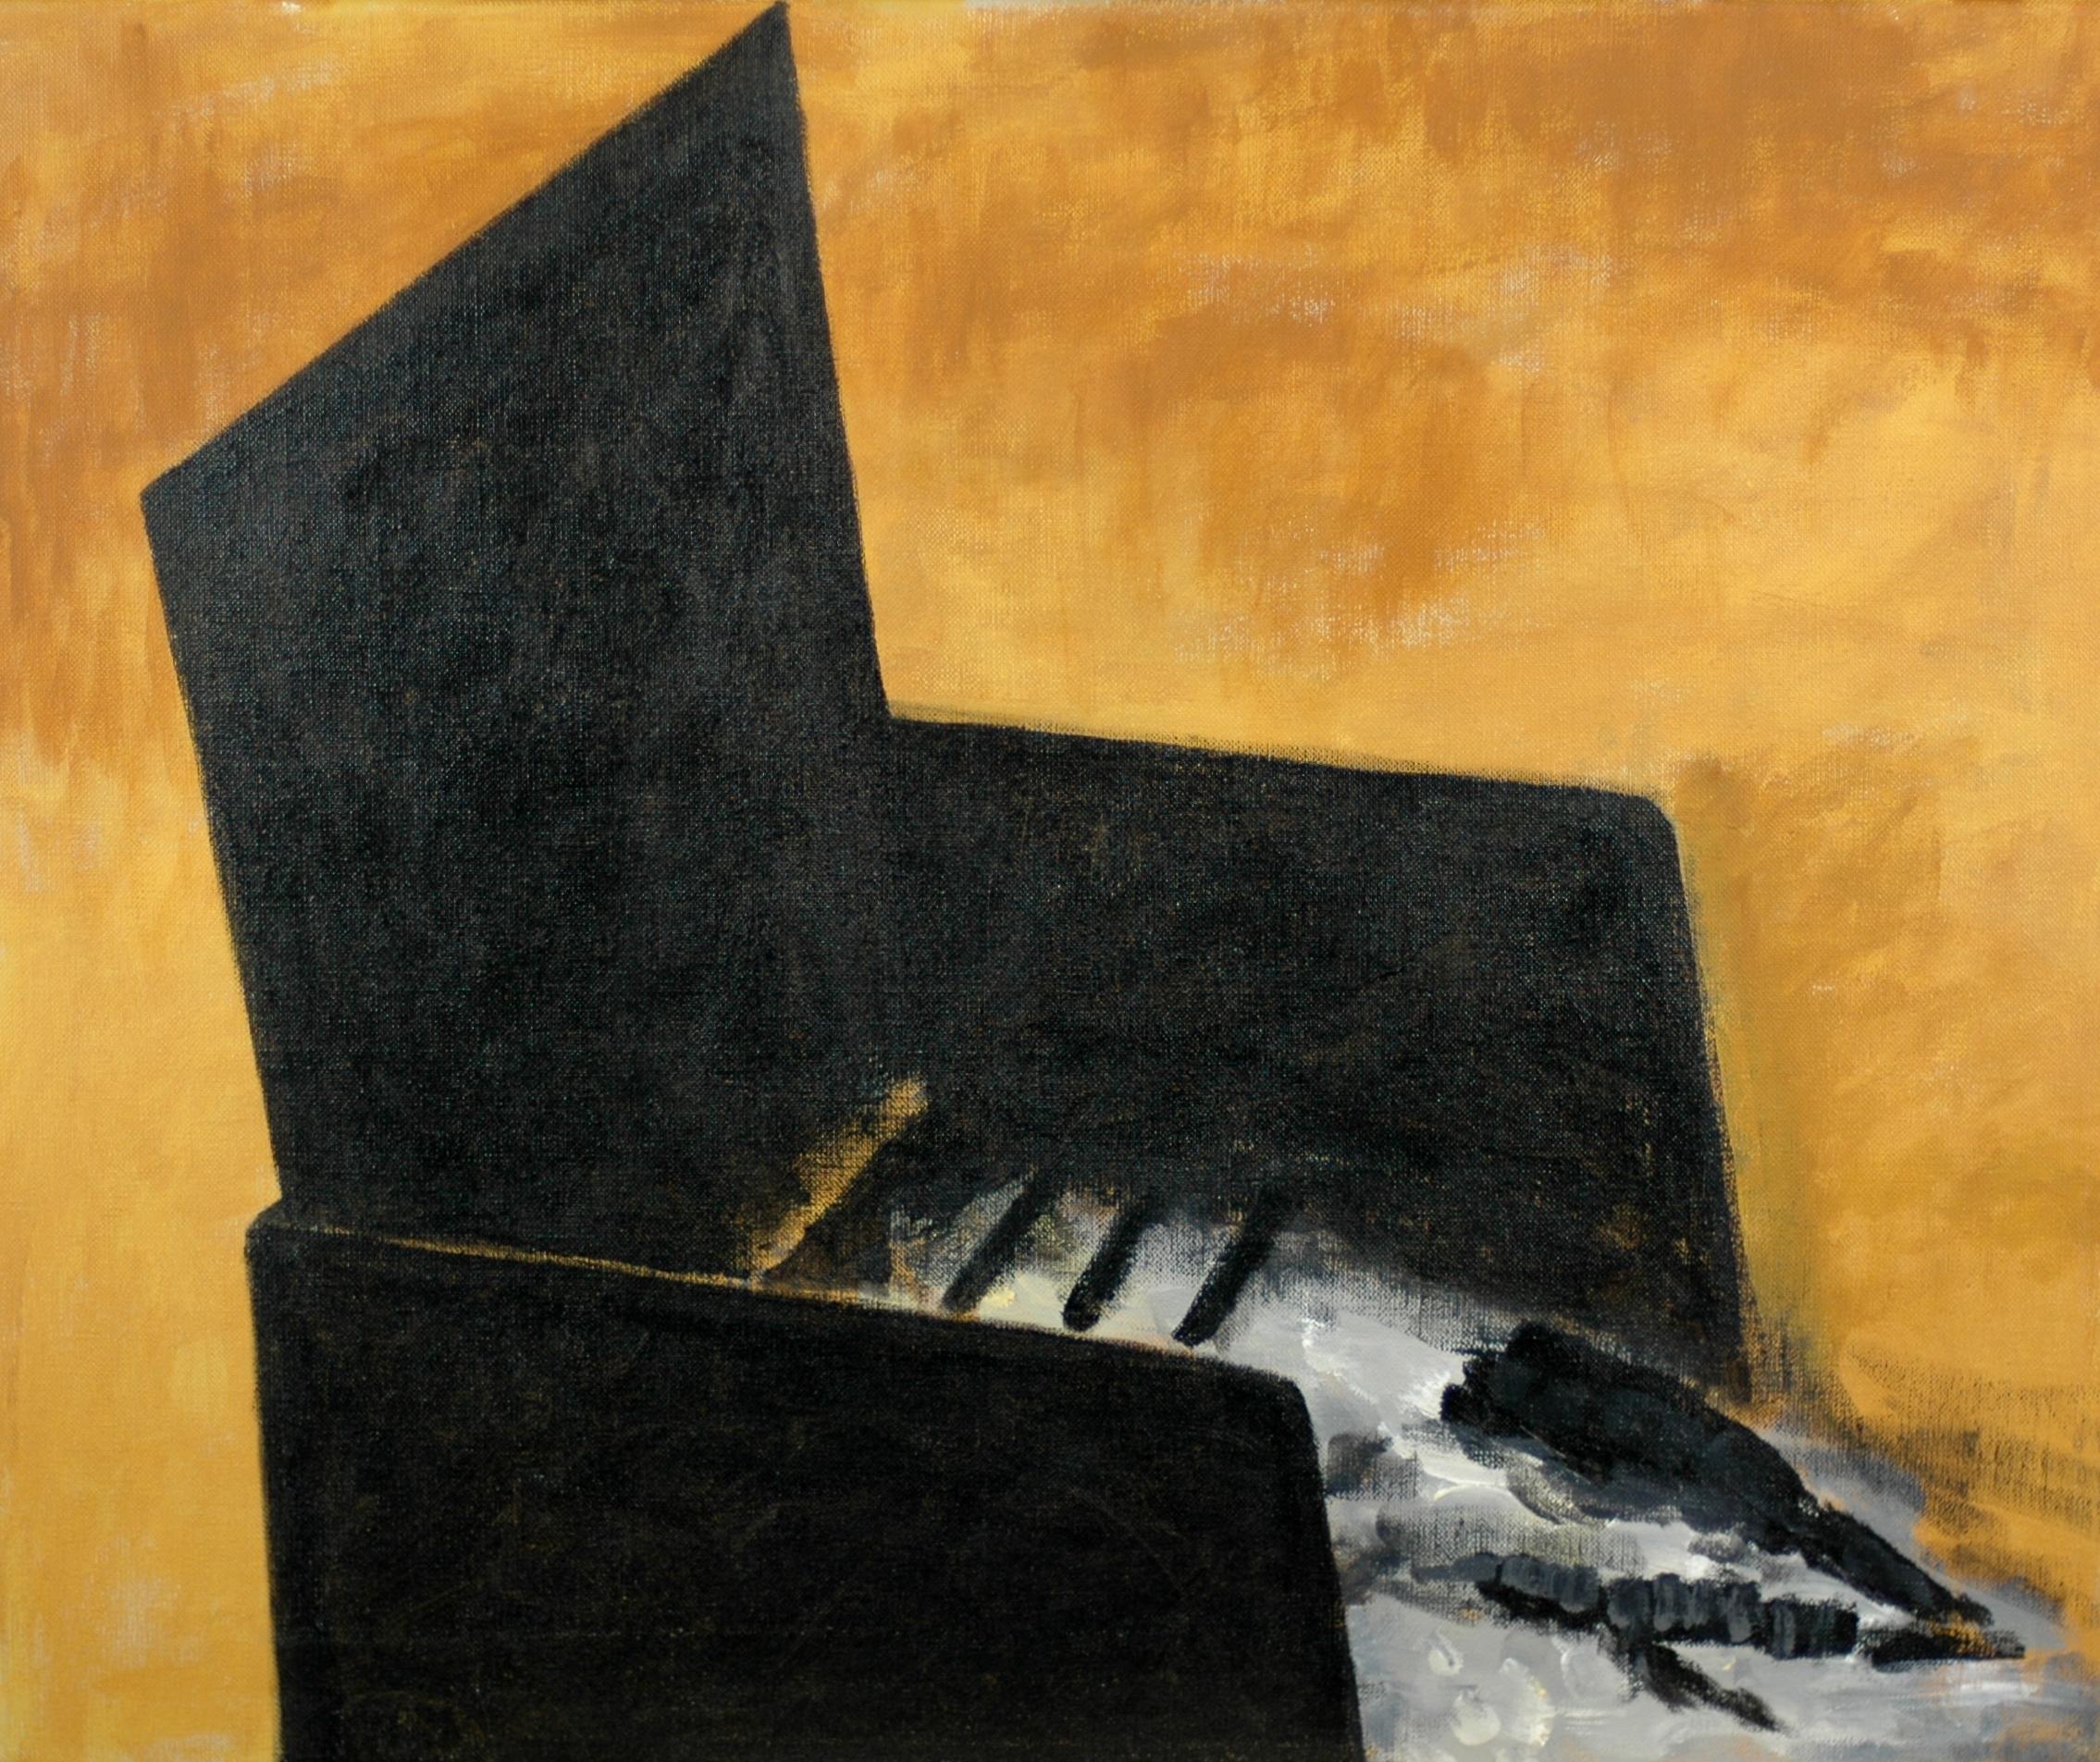 Fireplace 5, 2006